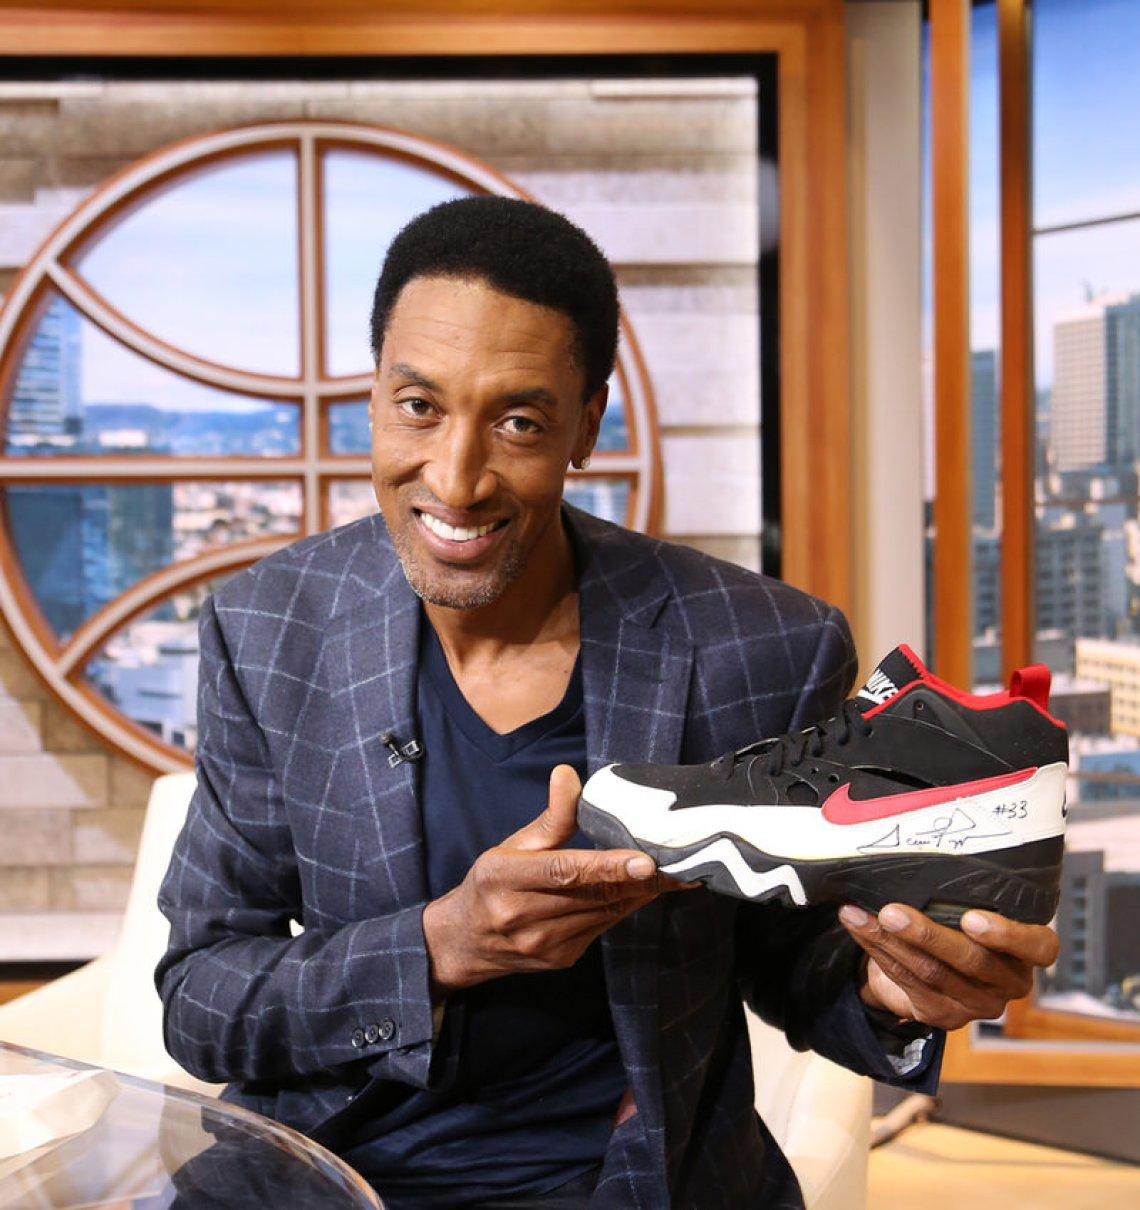 978f16de4f92f8 Scottie Pippen Signs Five Nike Signature Shoes For ESPN s Kicks 2 ...